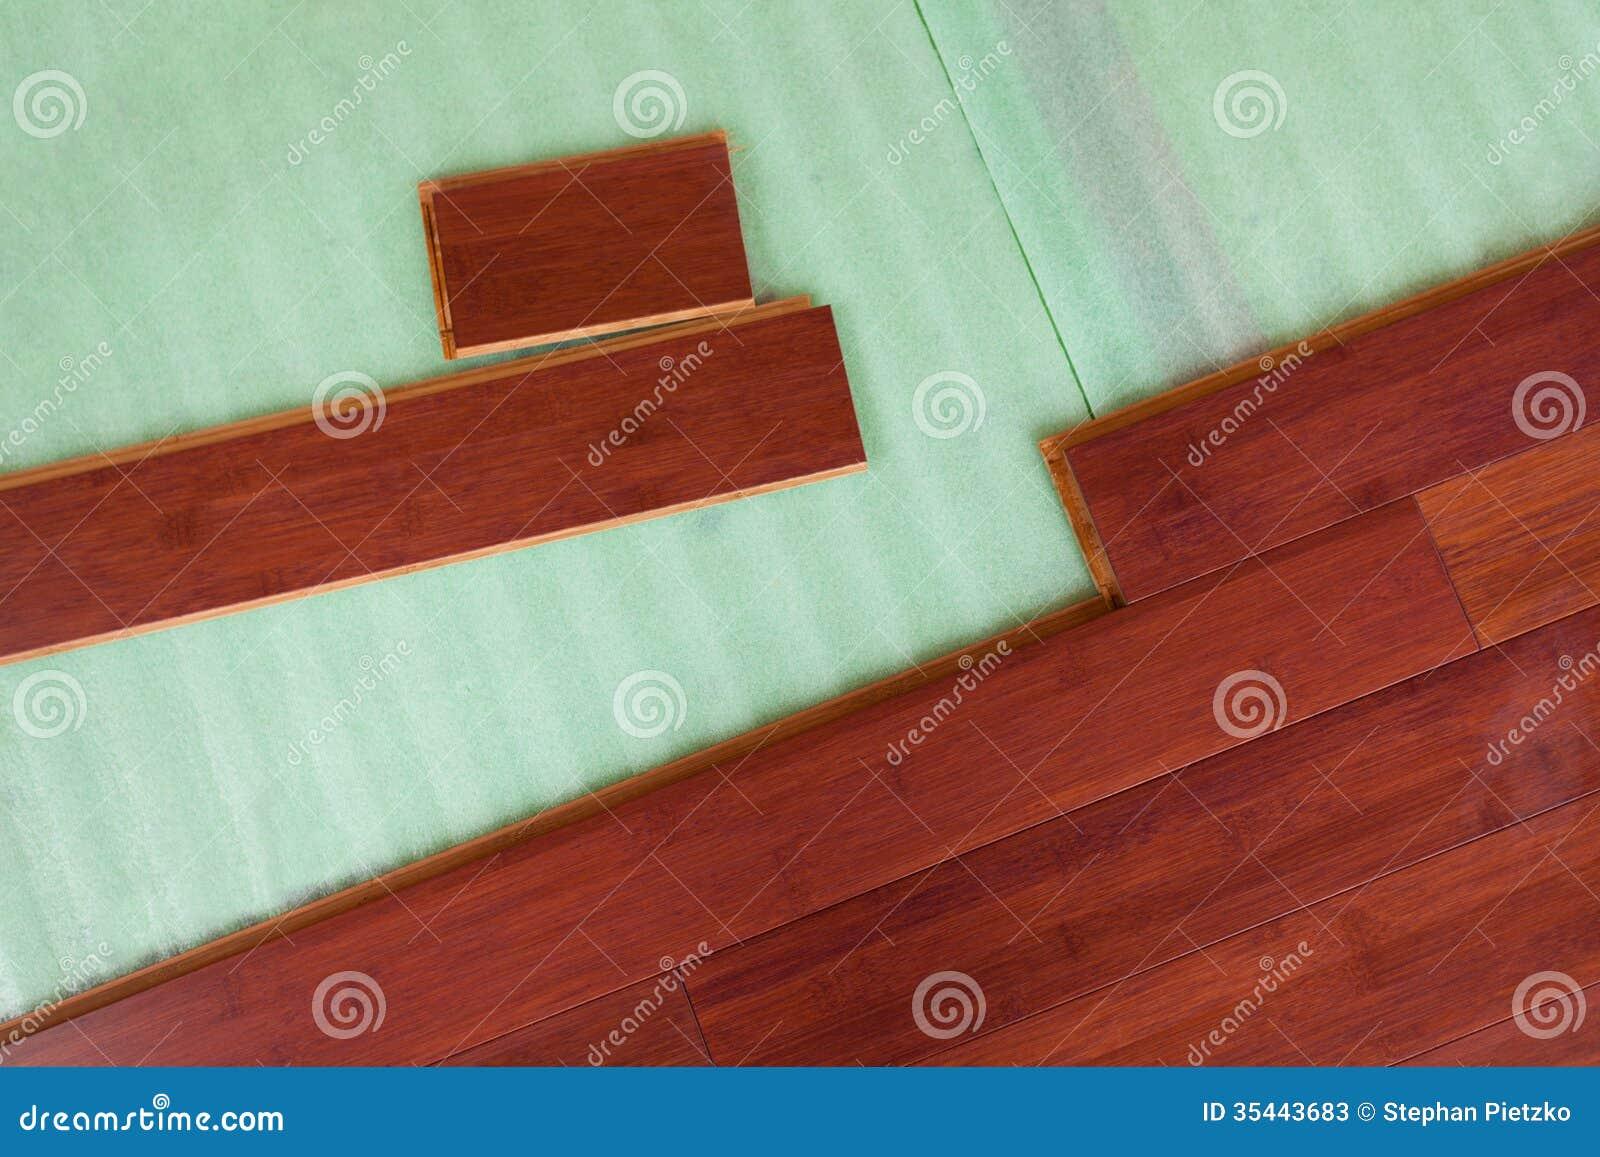 Photo vinyl tiles brisbane images vinyl flooring tiles top wood parquet flooring asbestos how to remove marley floor tiles your new red vinyl tile dailygadgetfo Images